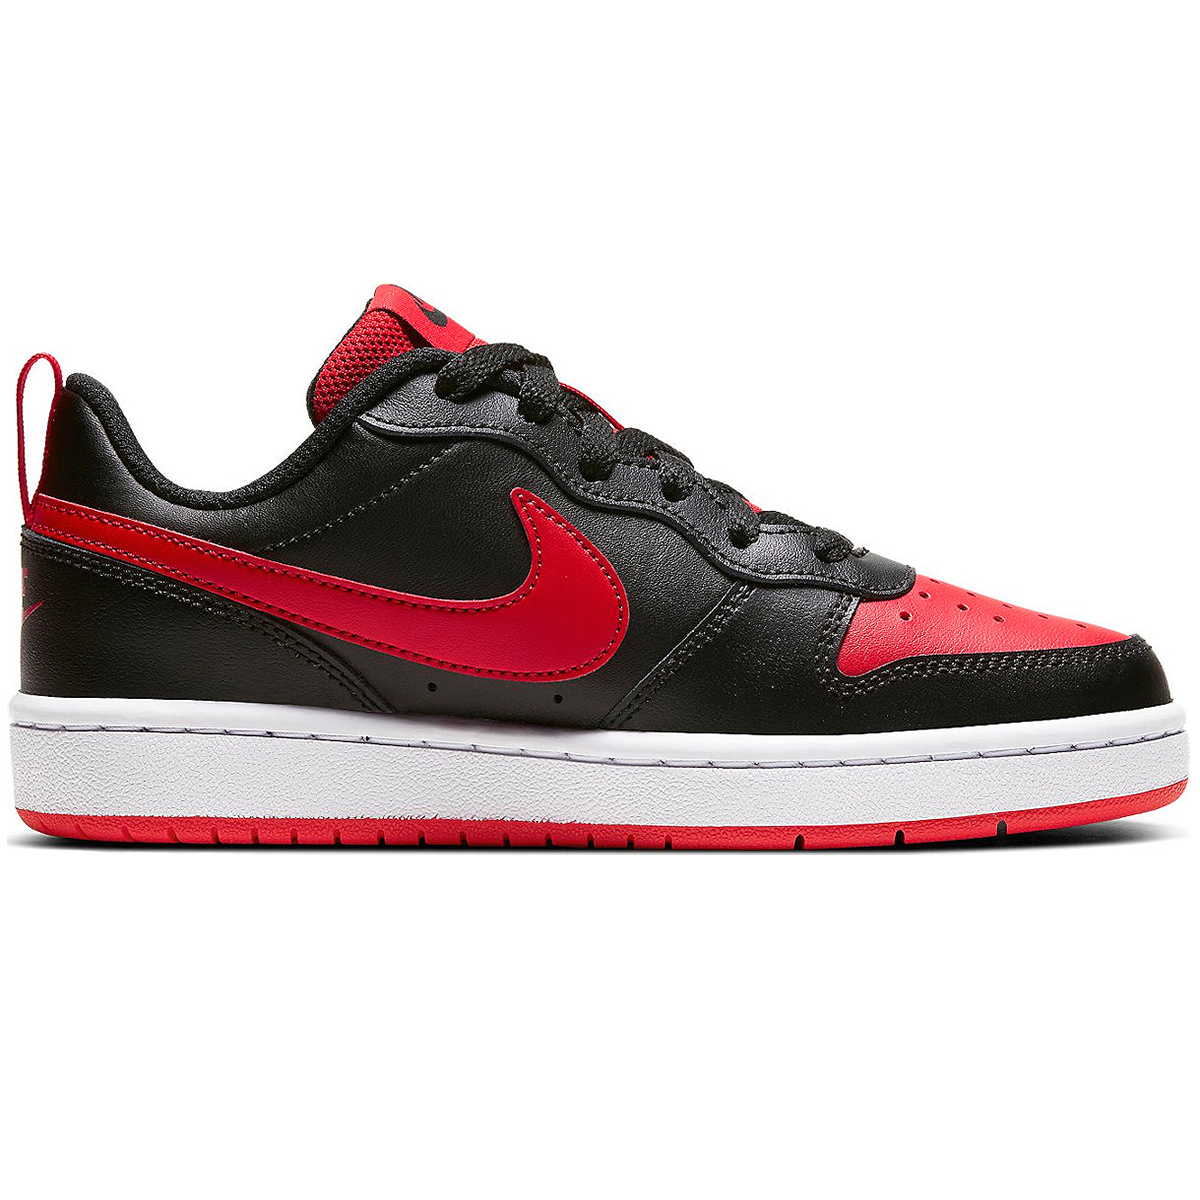 Nike Court Borough Low 2 GS Kinder Sneaker schwarz rot BQ5448 007